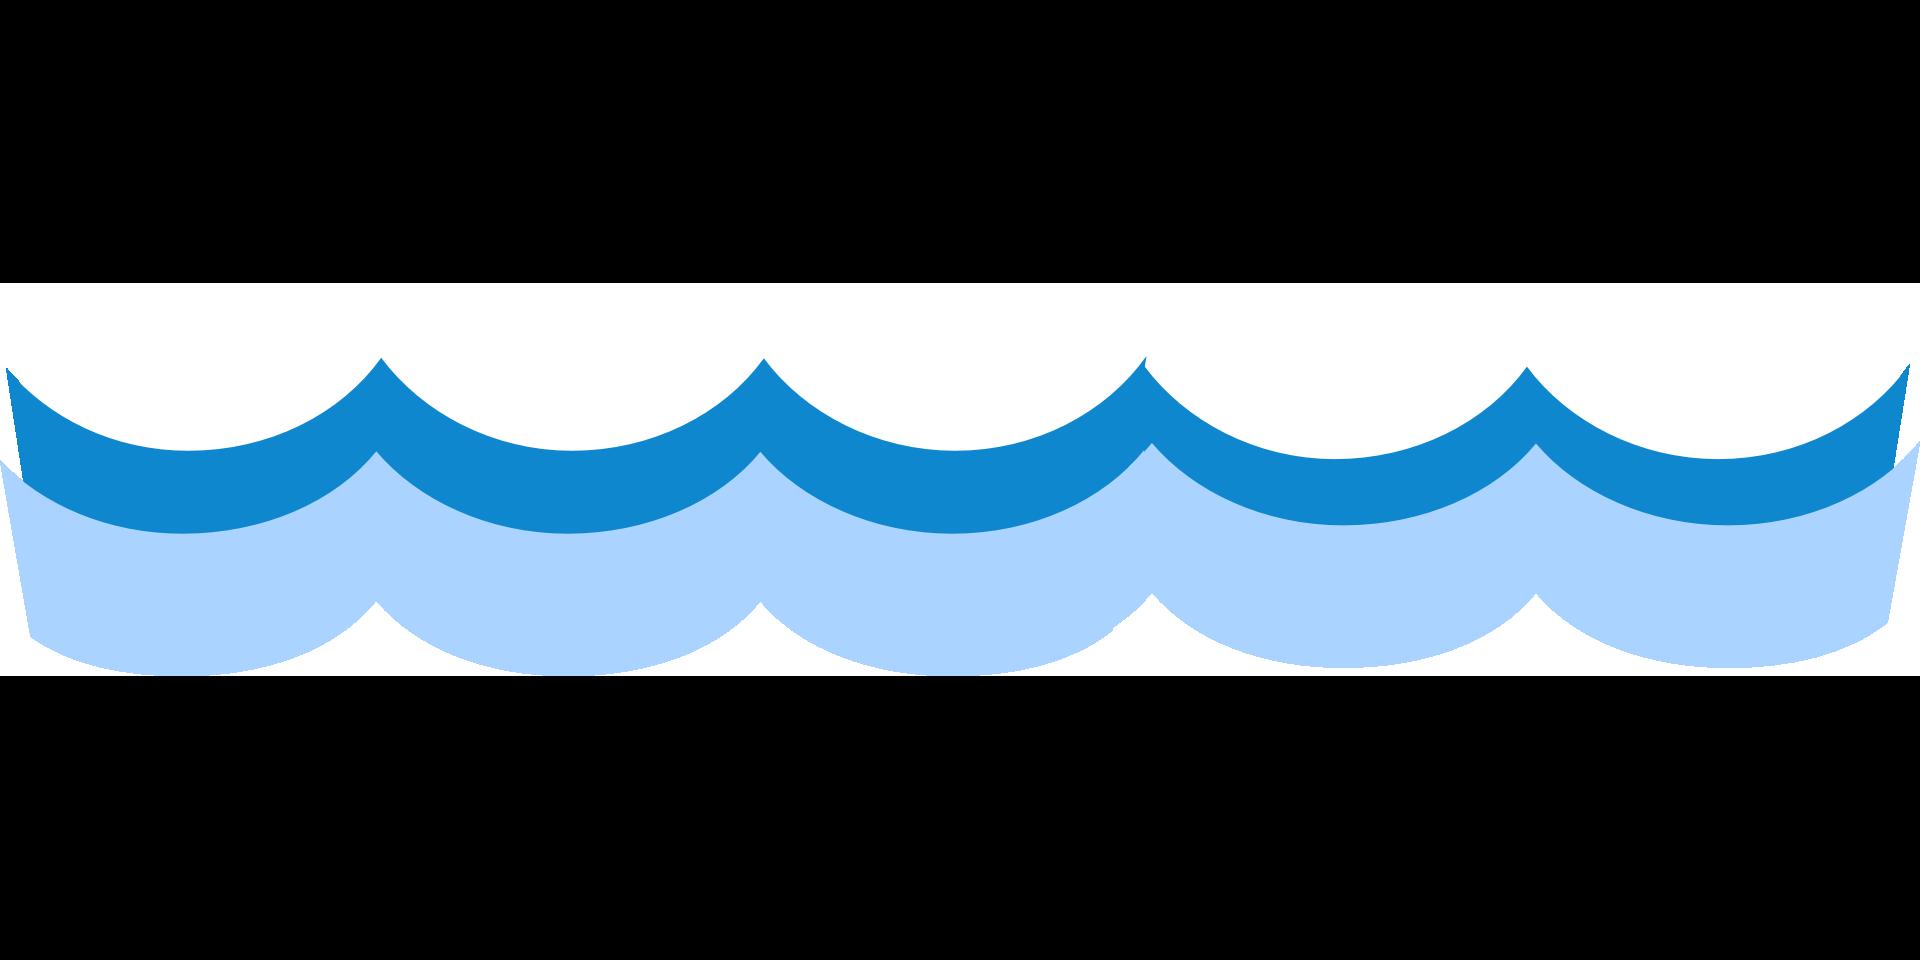 Waves sea water ocean. Clipart wave tide